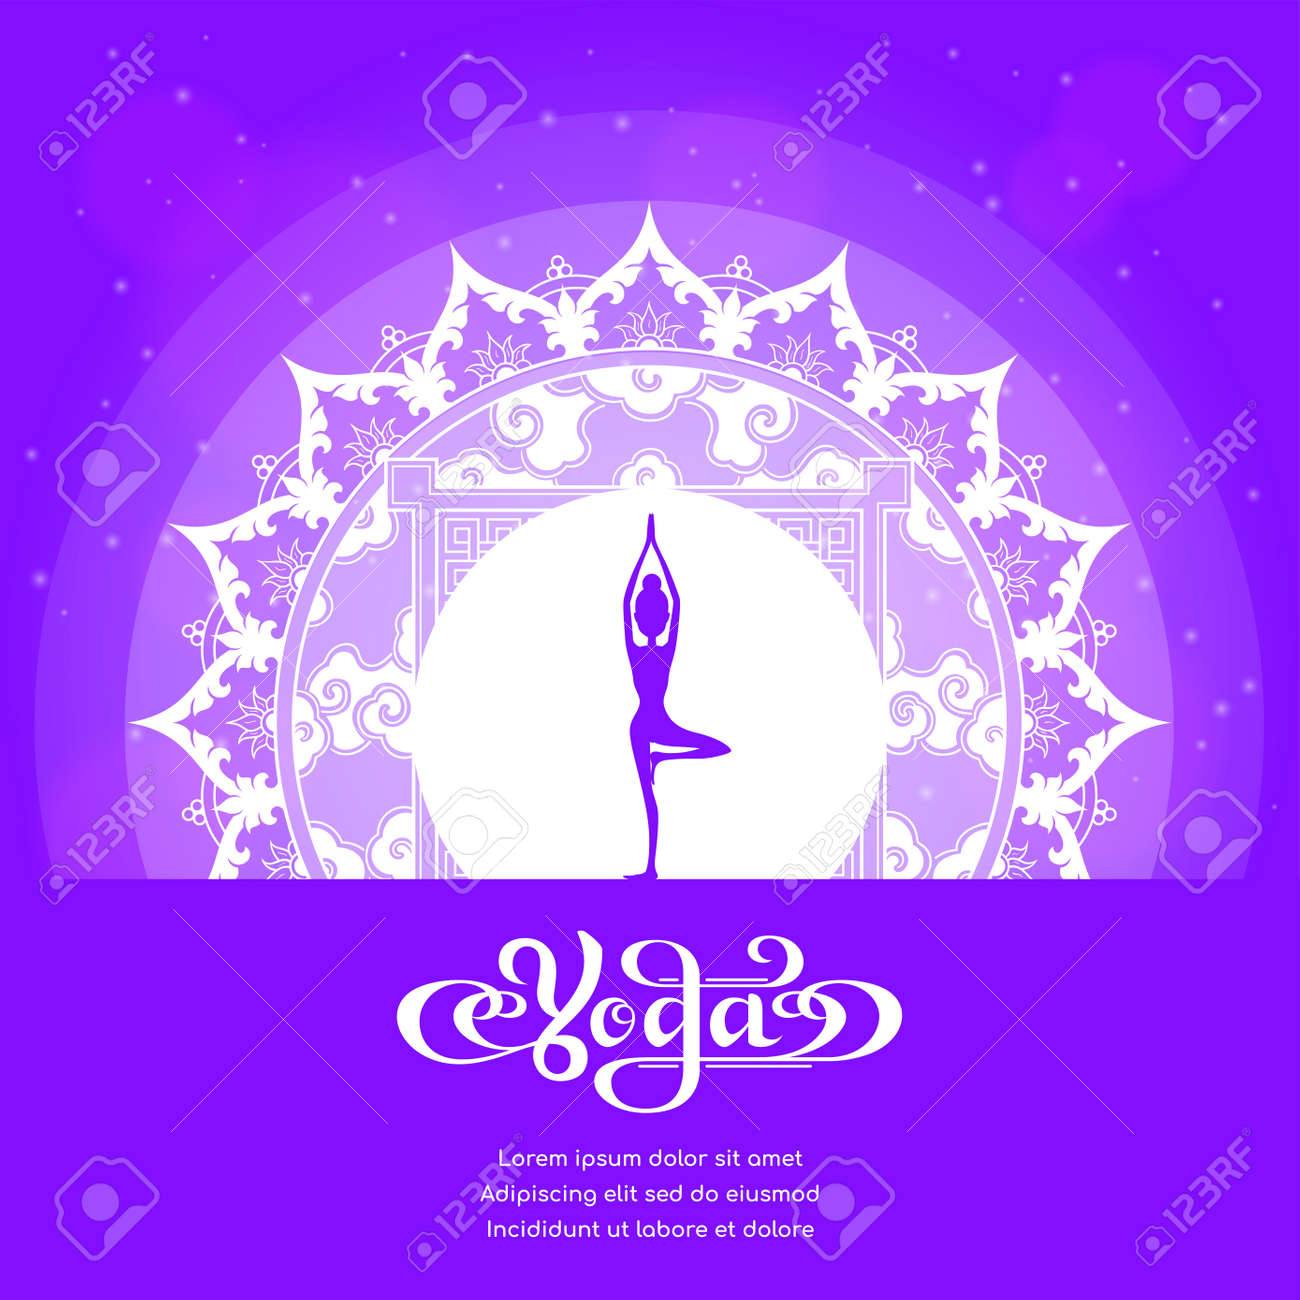 Yoga Studio Logo With Mandala Design Banner Design For Yoga Royalty Free Cliparts Vectors And Stock Illustration Image 114372558